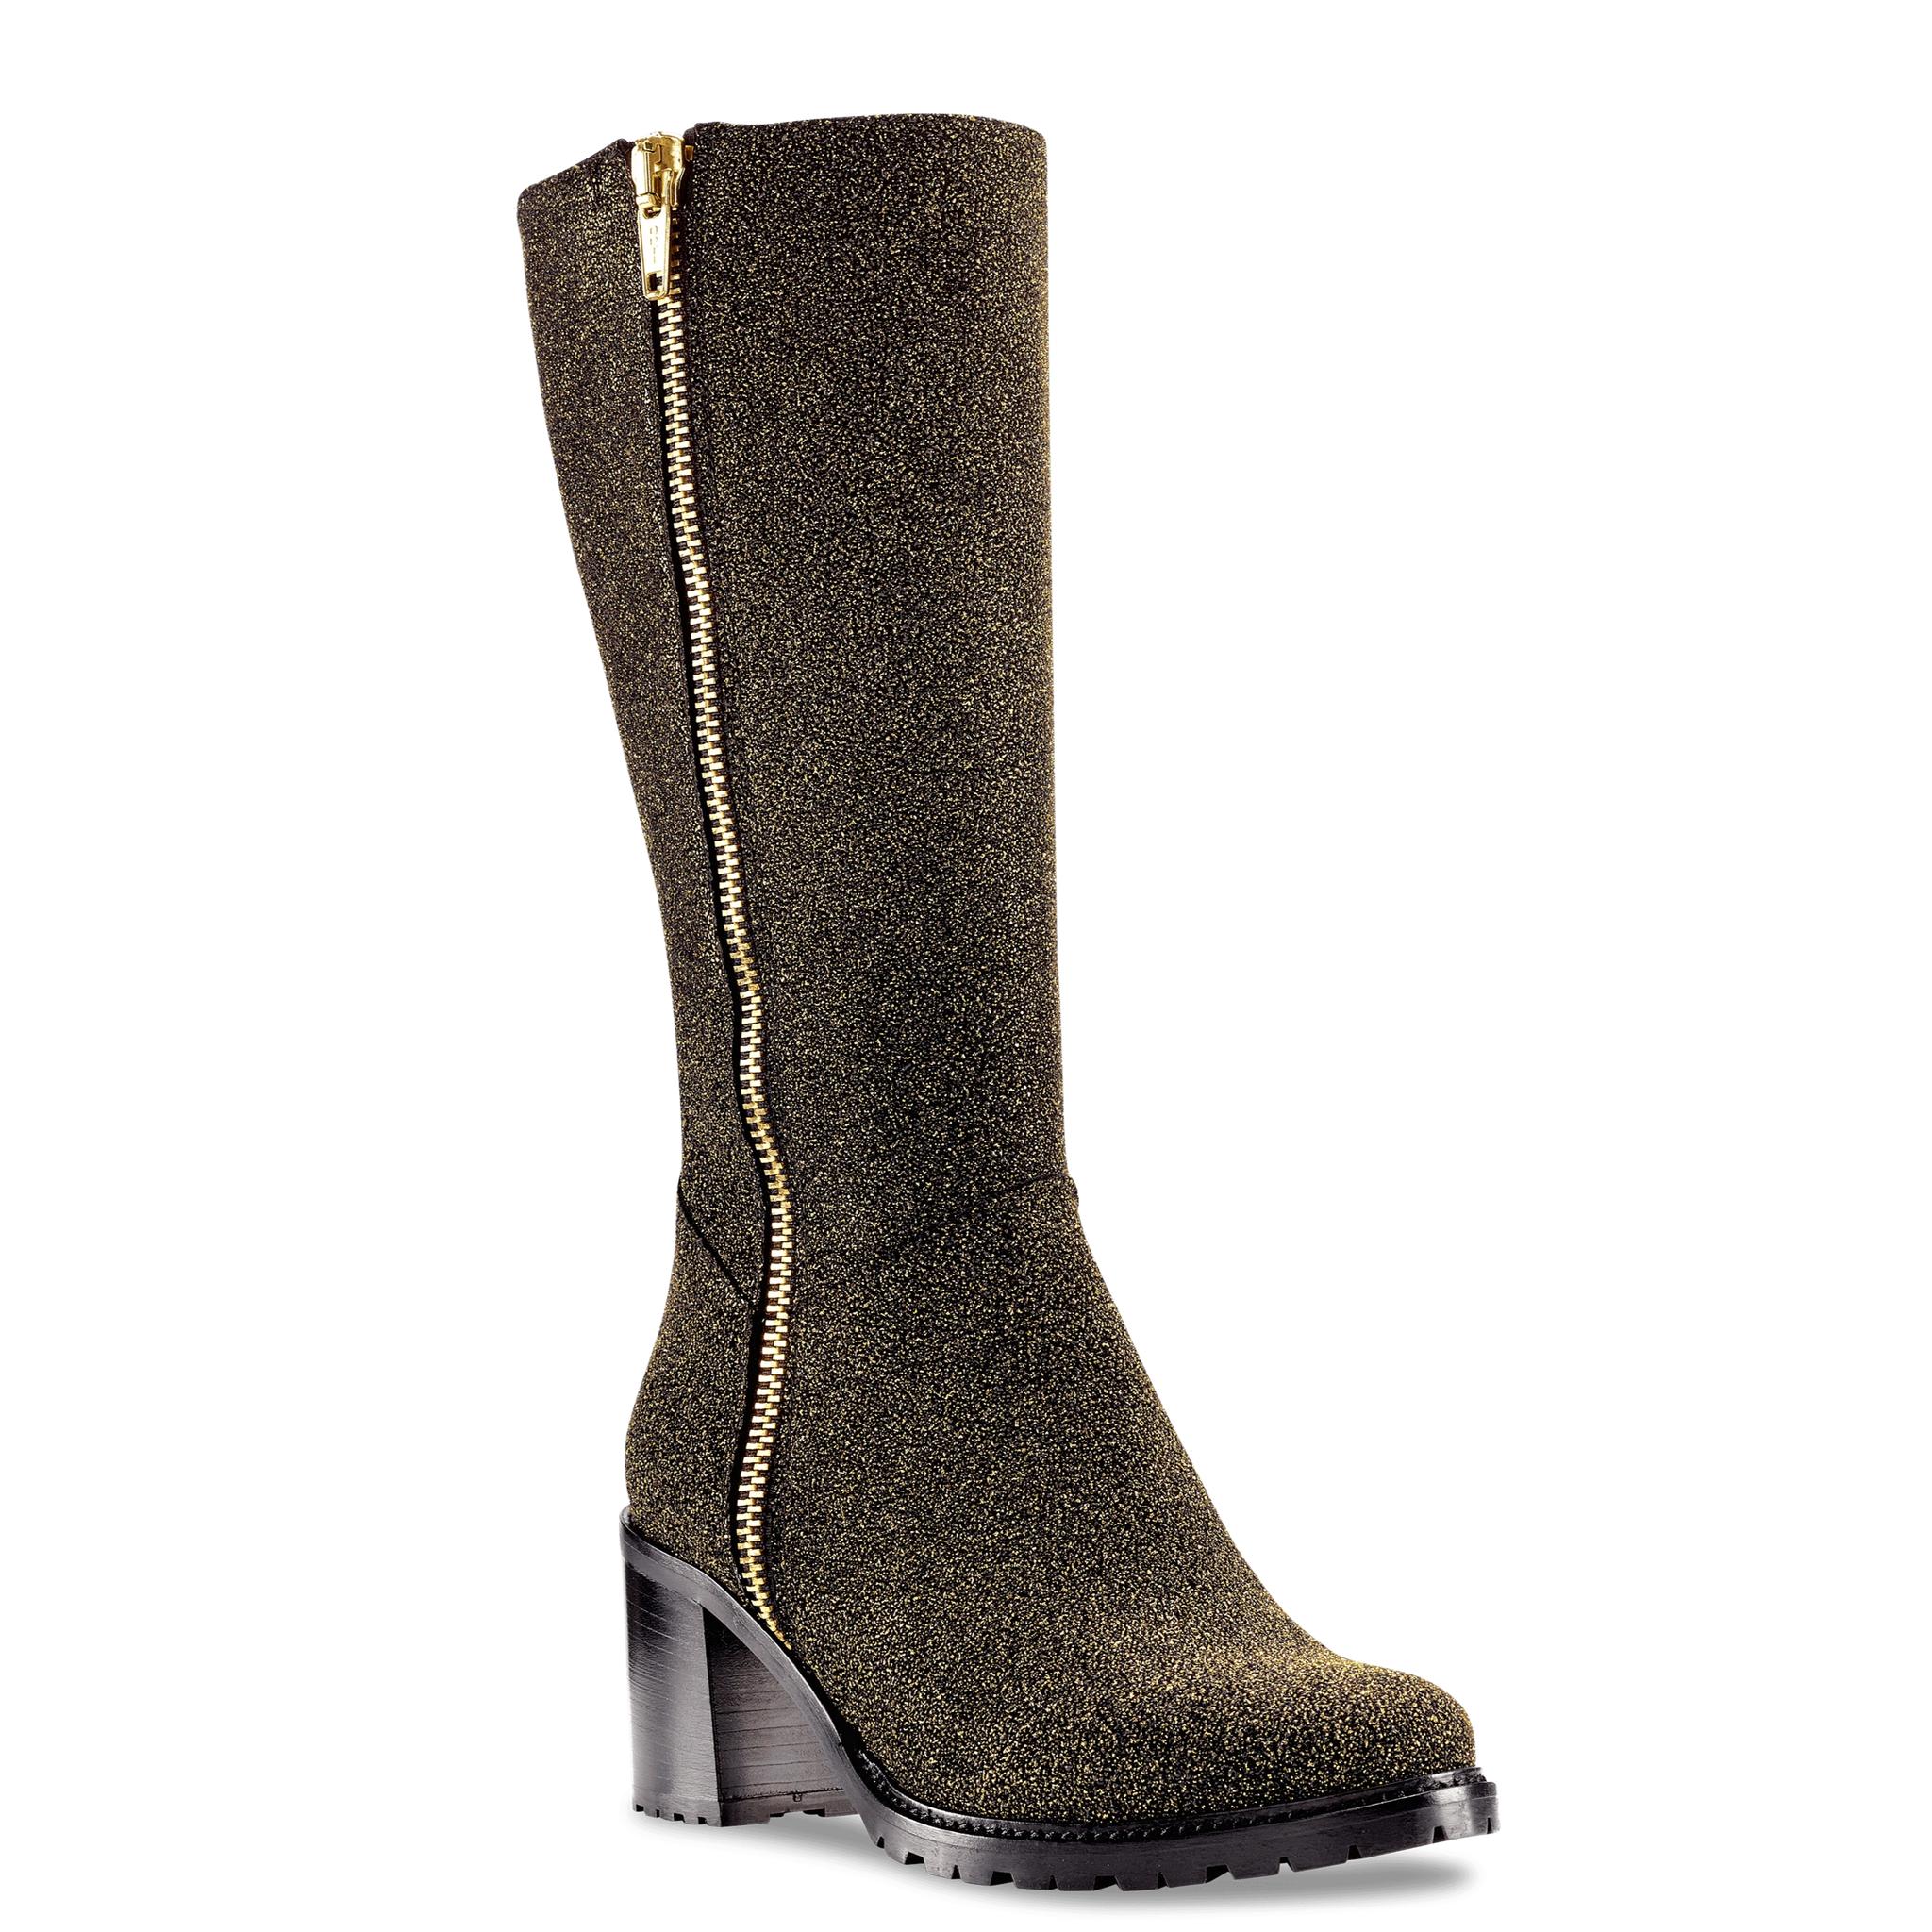 Ross & Snow Rosina Women's Gold Tall Boot - Discount Italian Shoes